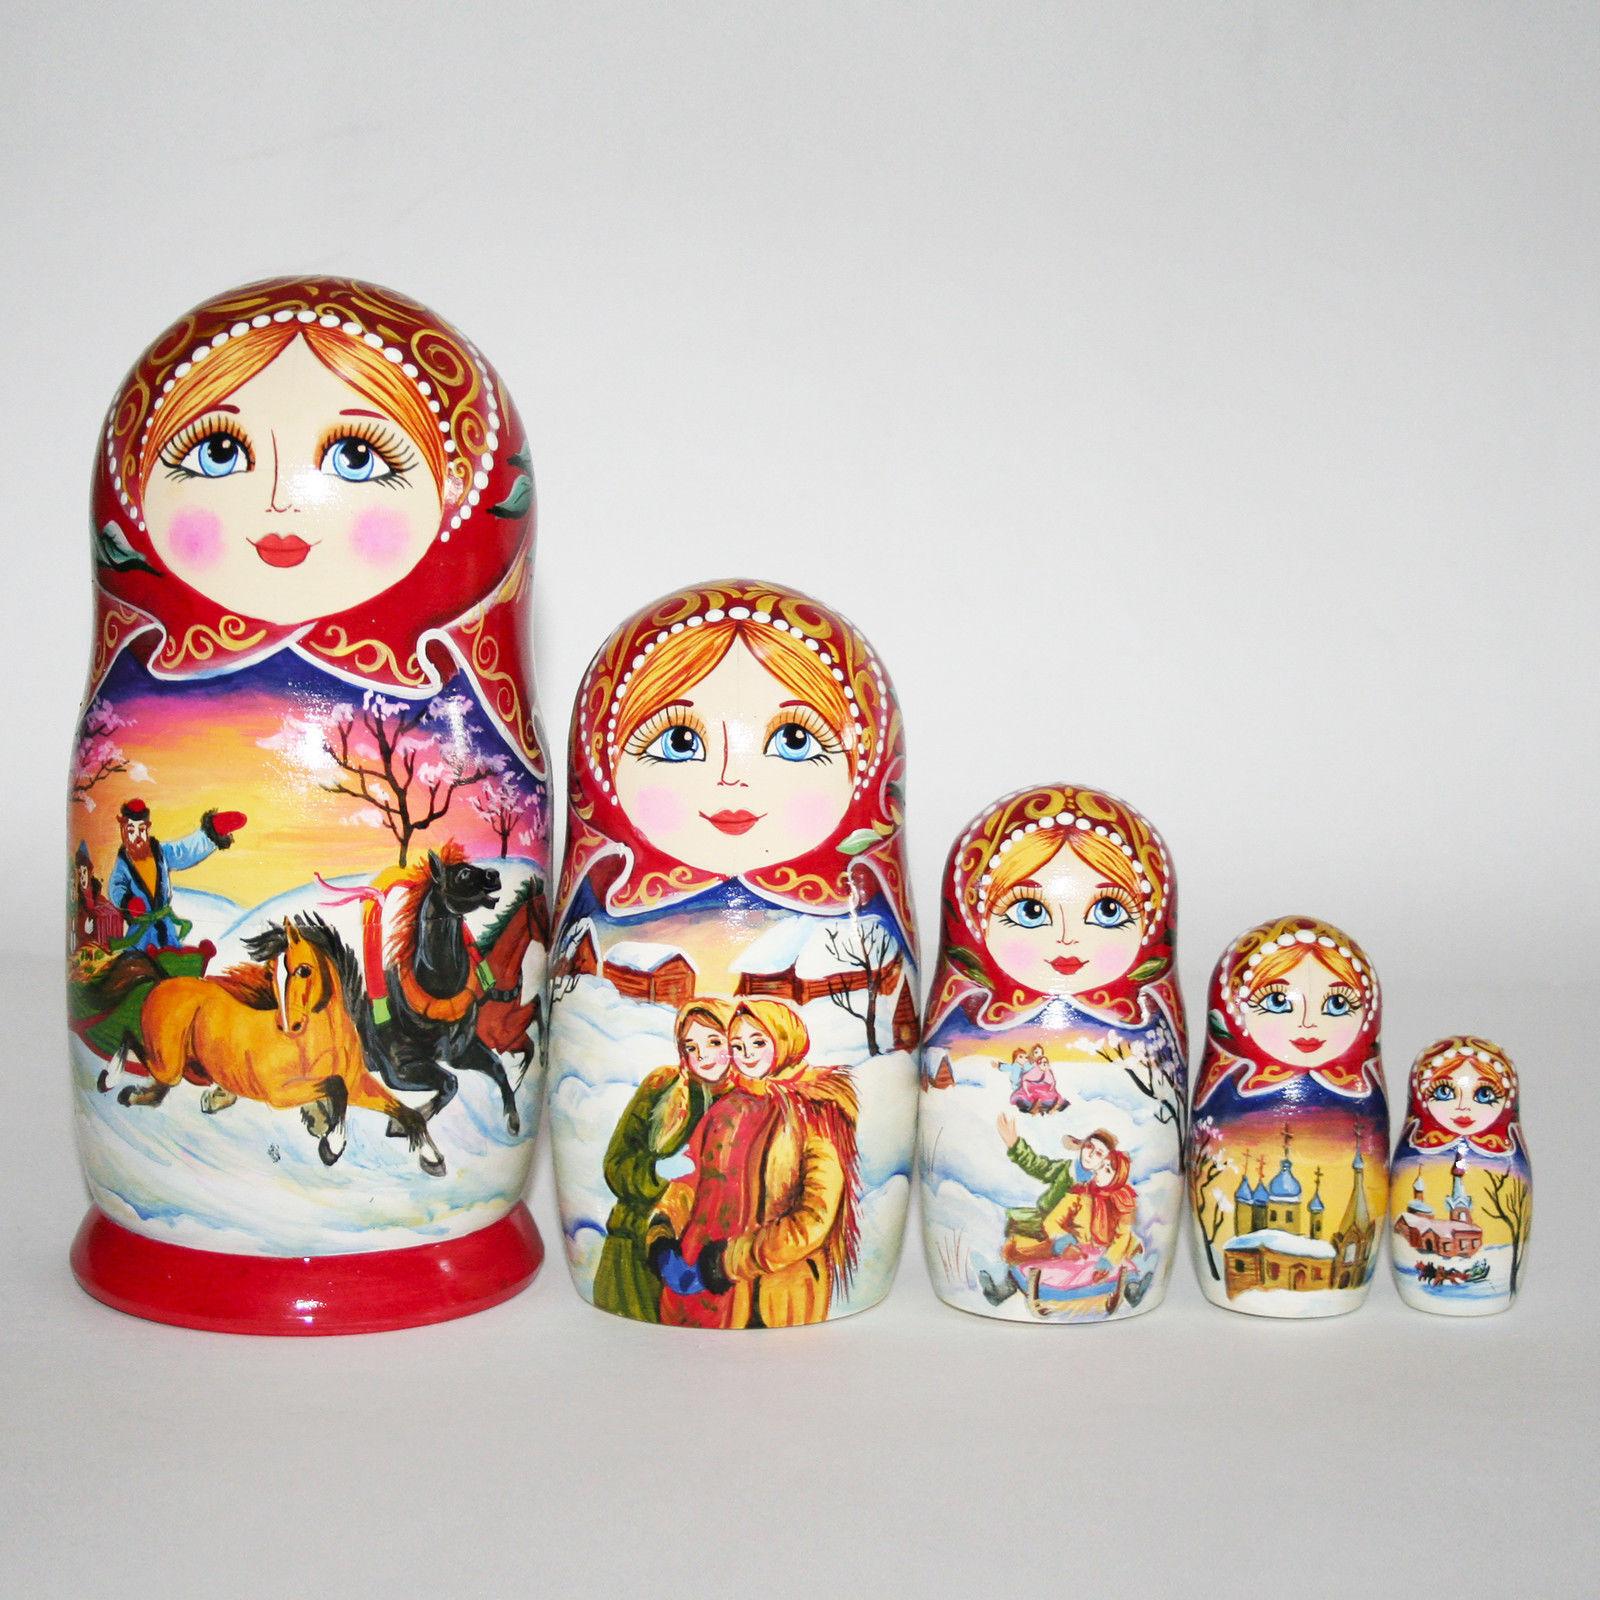 Nesting dolls Three Pferds Winter landscape Russian village Hand-Painted signed